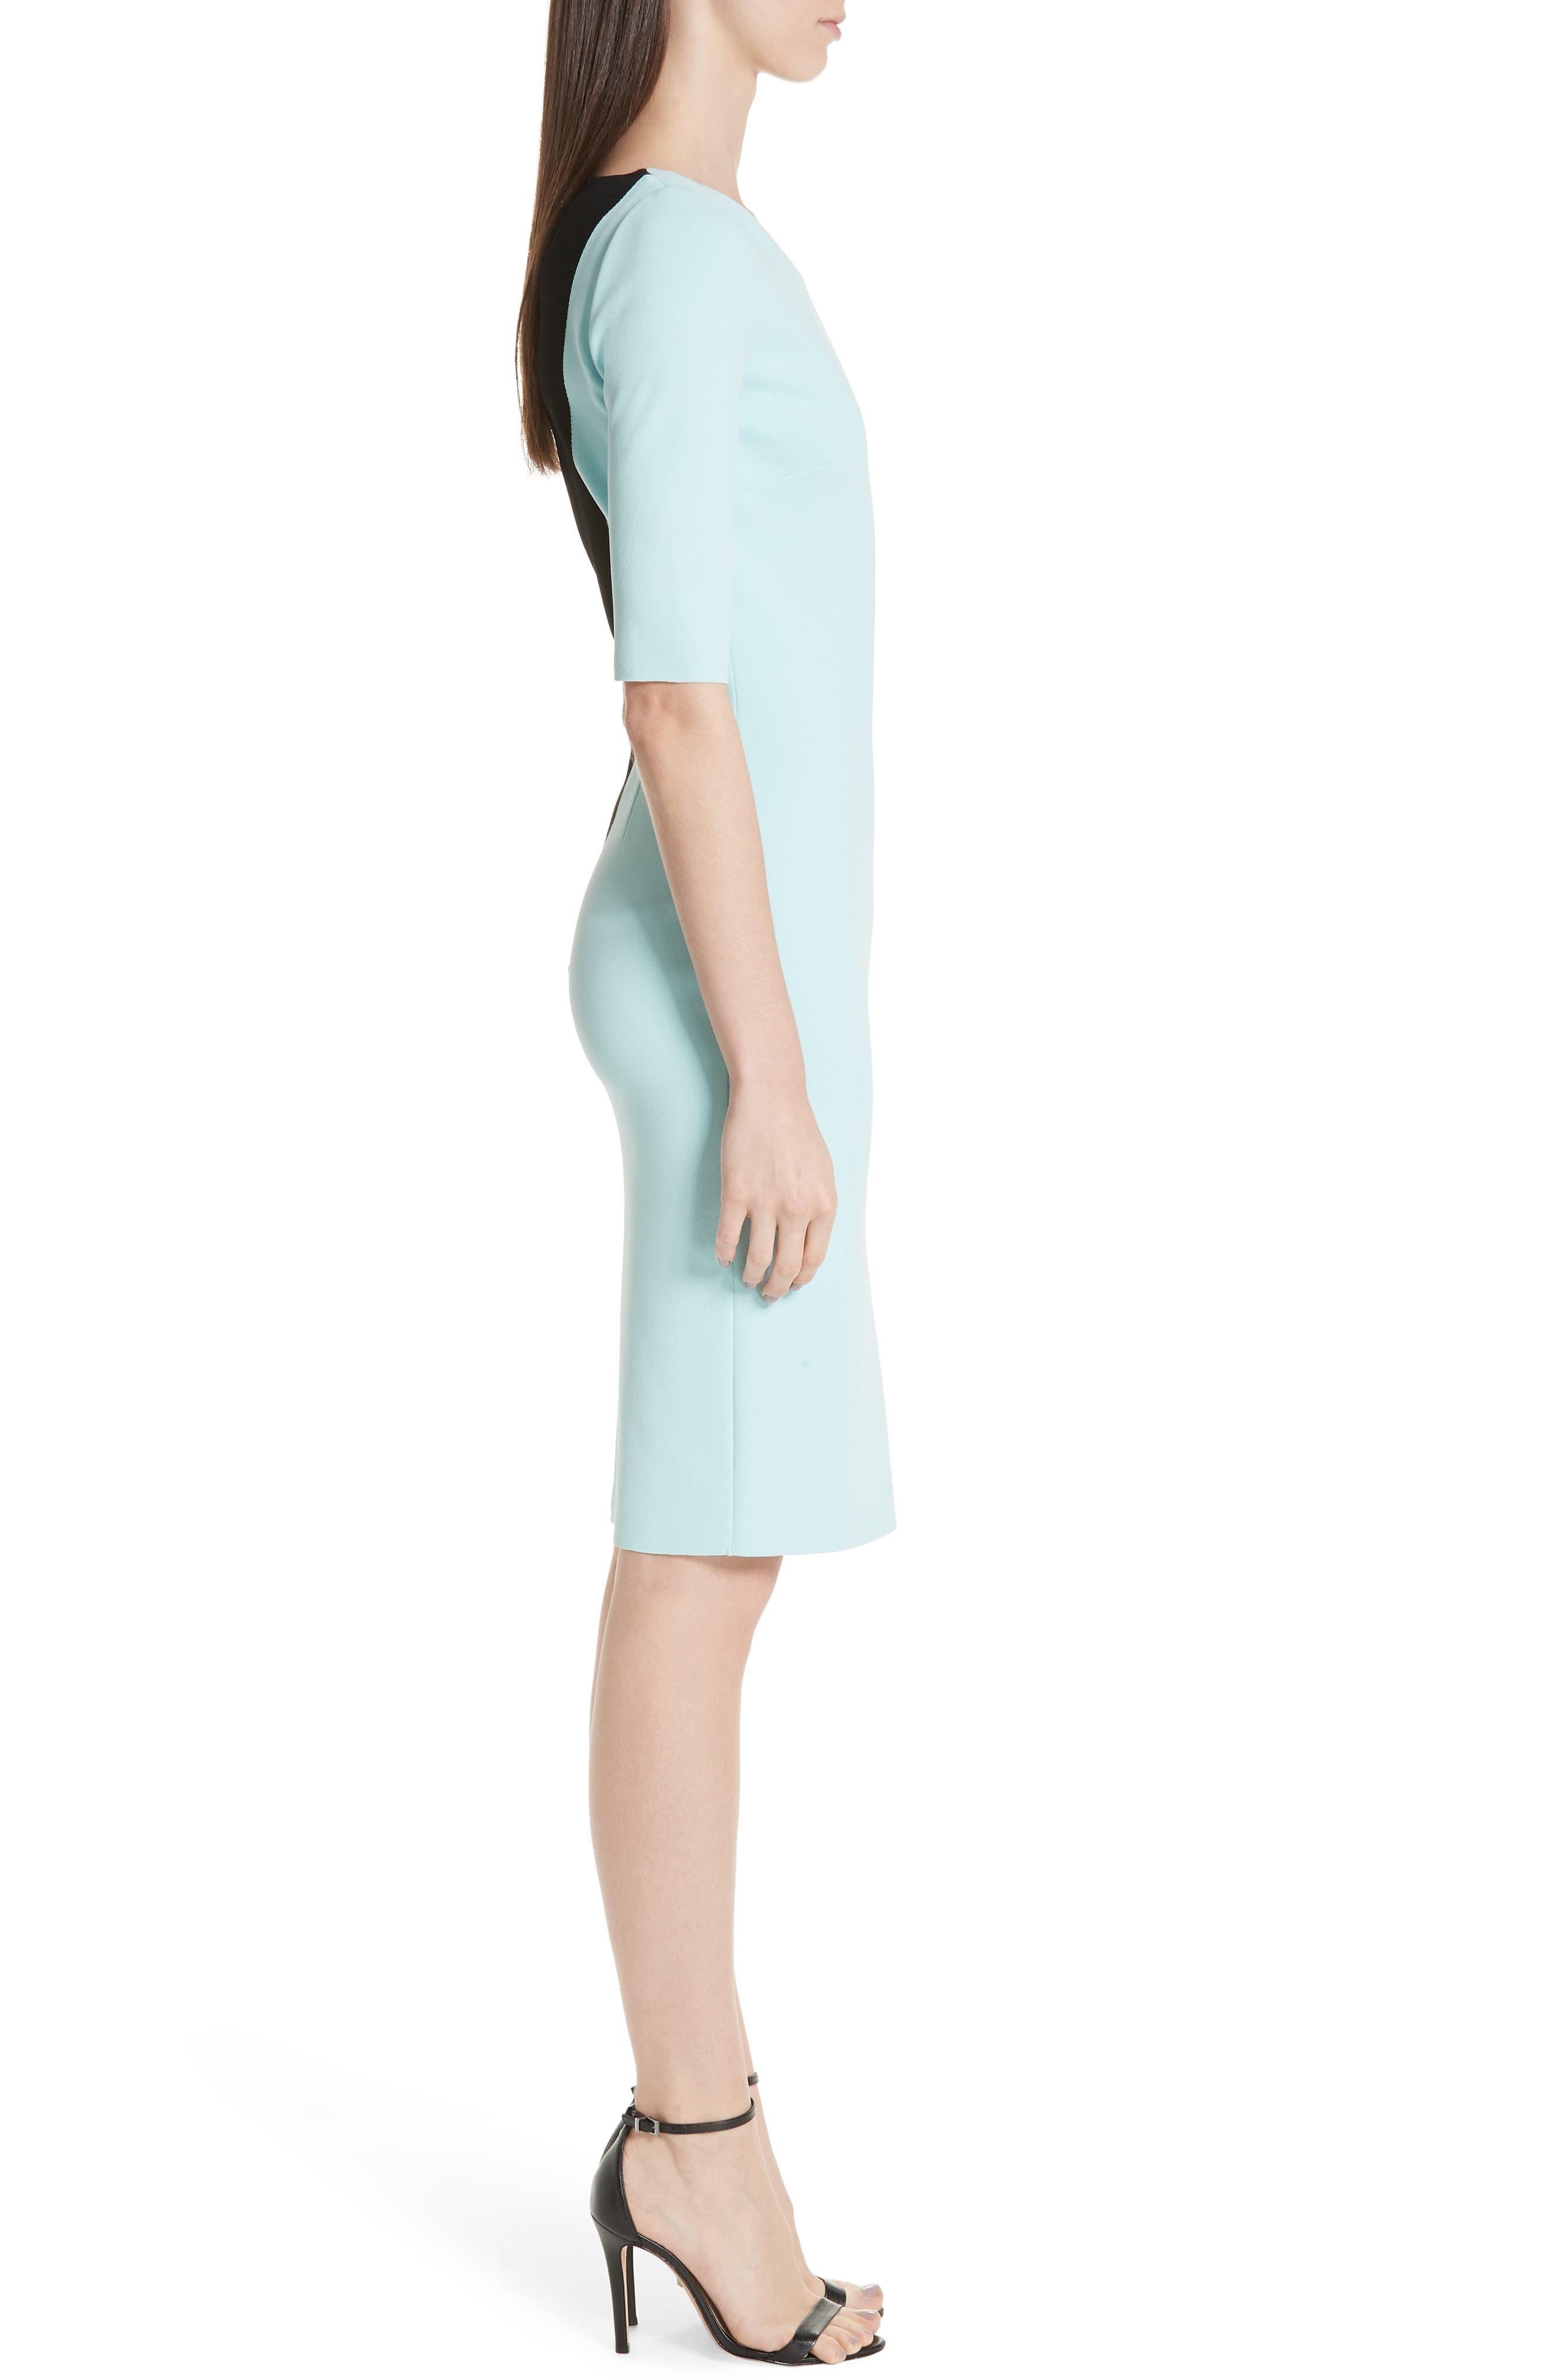 ST. JOHN COLLECTION, Luxe Sculpture Knit Dress, Alternate thumbnail 4, color, SEAFOAM/ CAVIAR